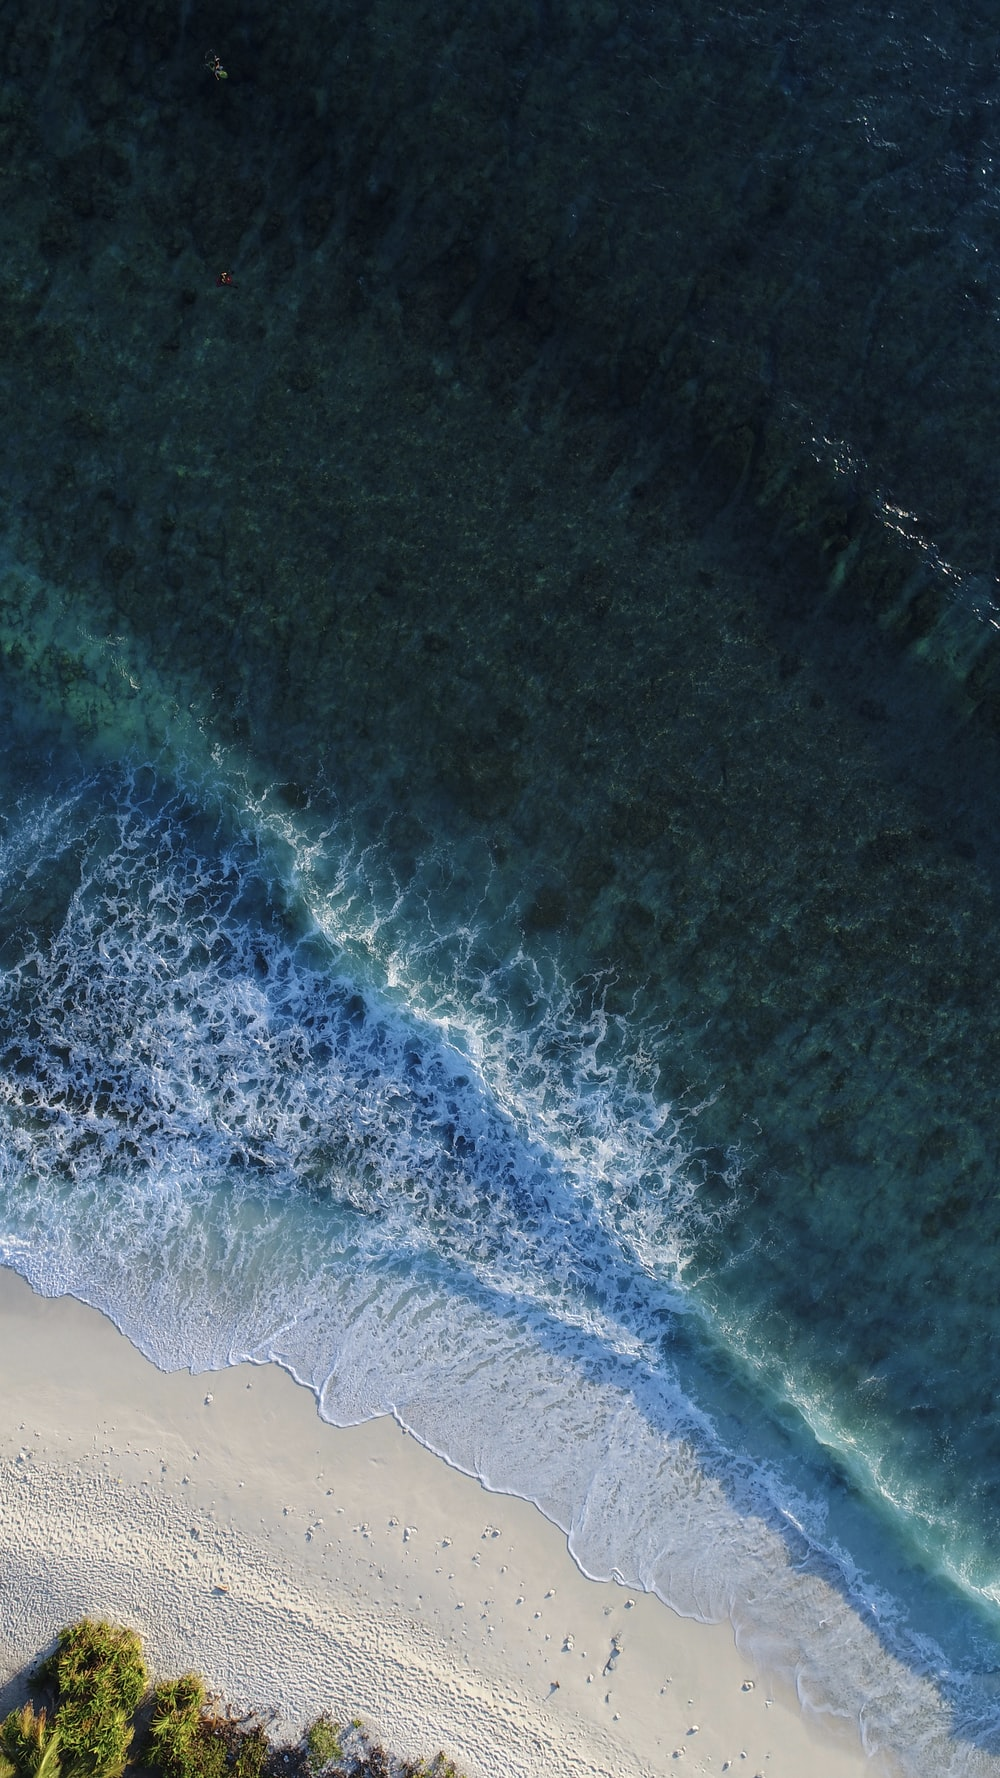 Iphone X Wallpapers Free Hd Download 500 Hq Unsplash